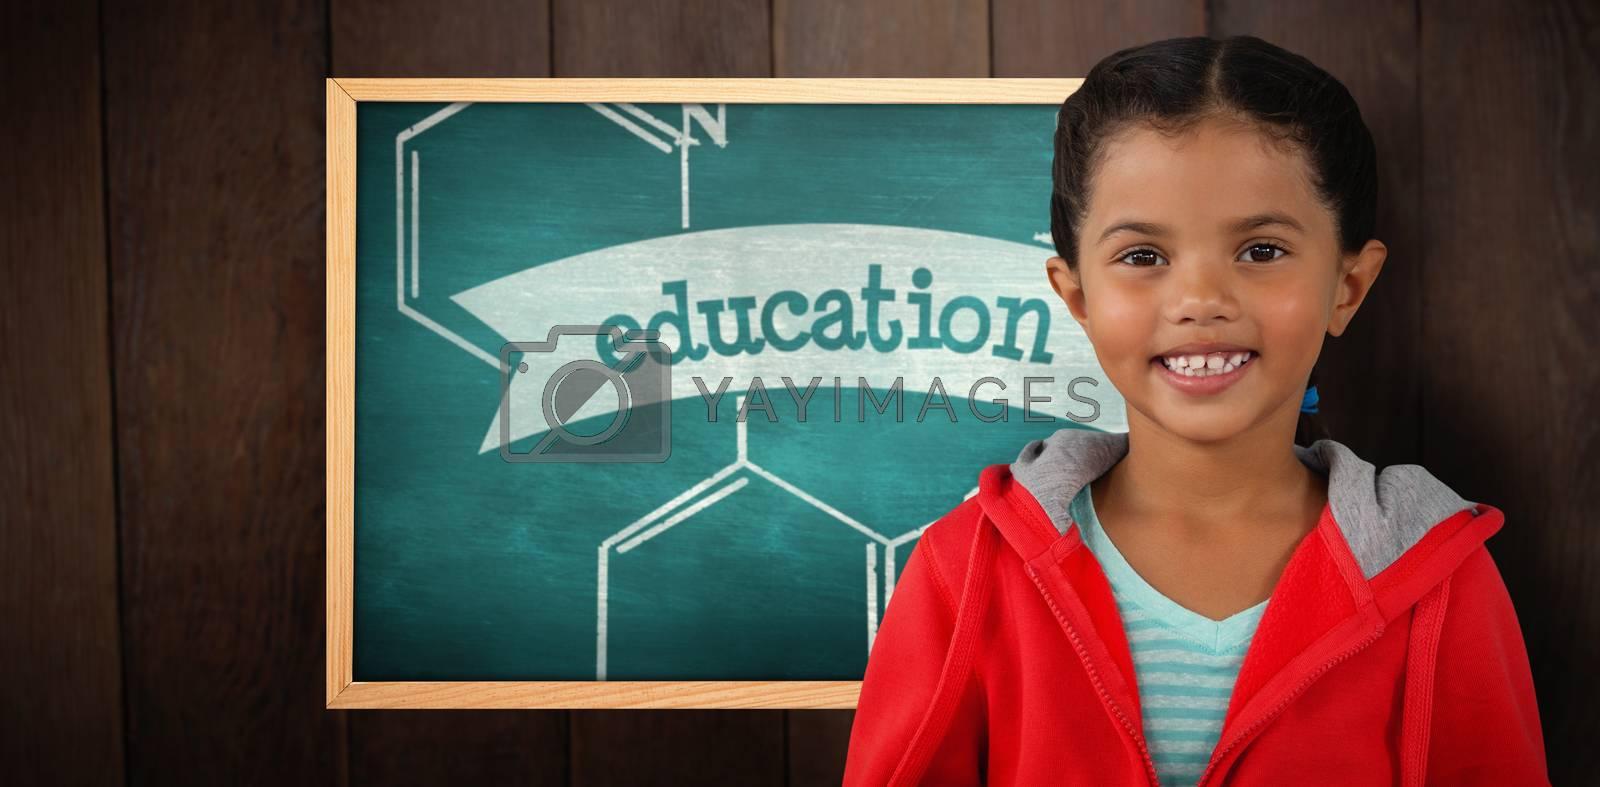 Portrait of smiling girl holding digital tablet against education against green chalkboard